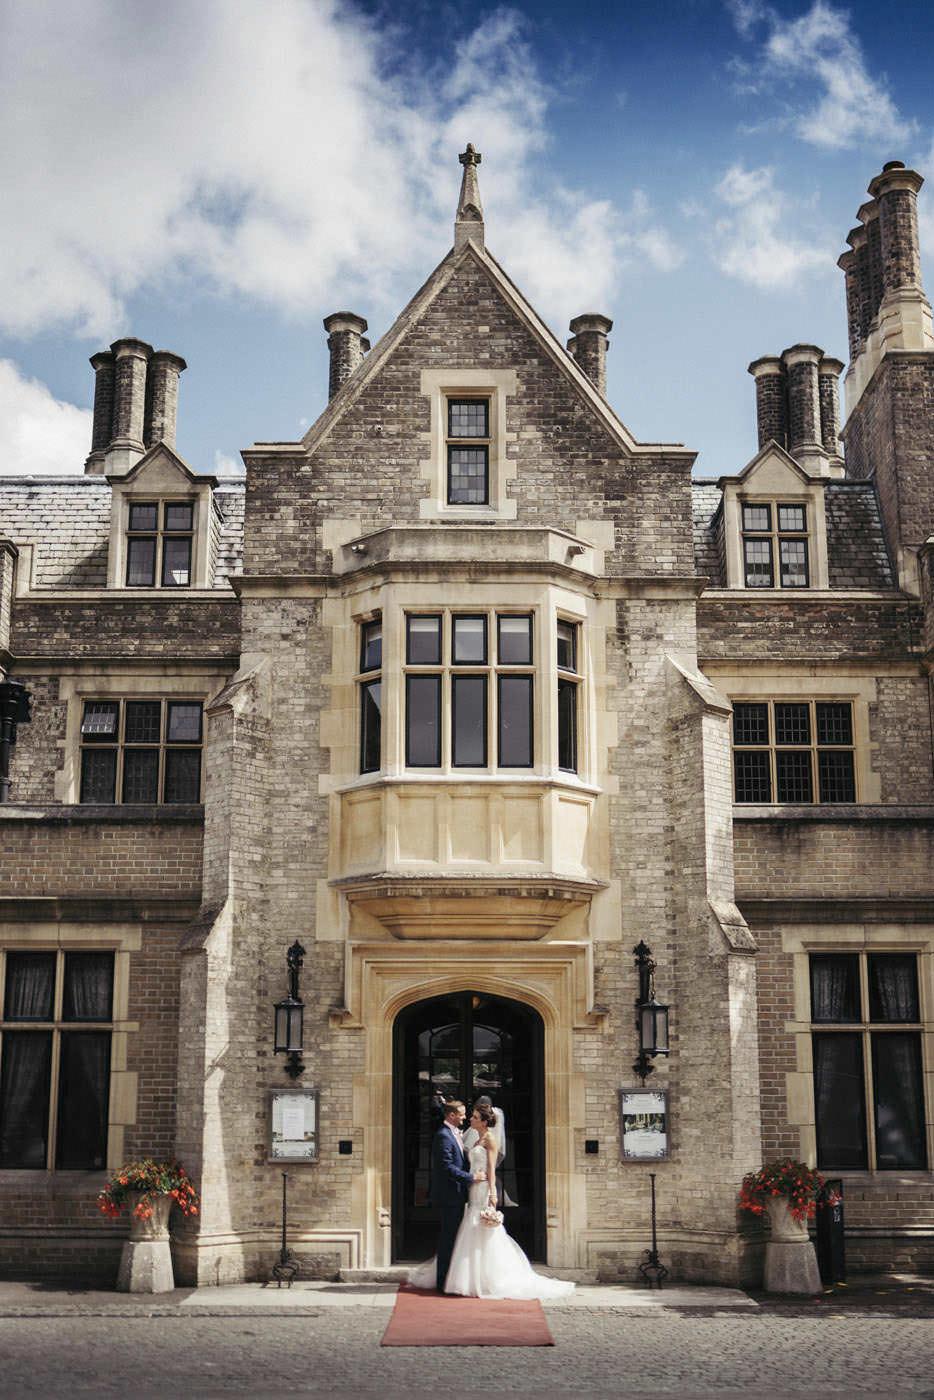 lukeemily foxhills wedding photographer 0082